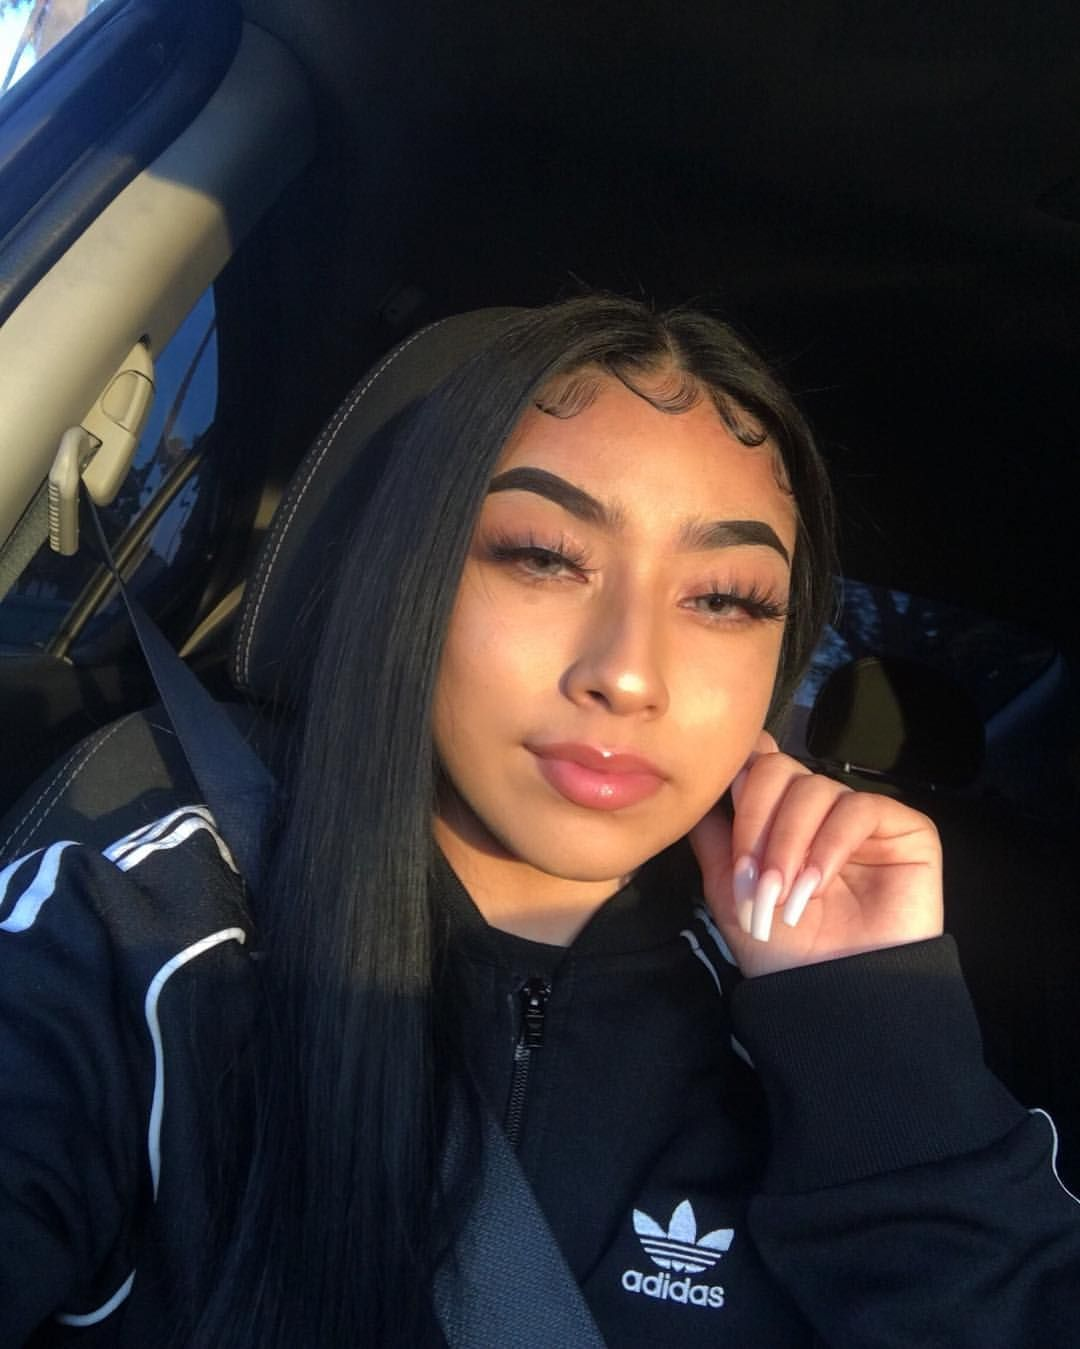 Destiny Gutierrez D Beendidthat Instagram Photos And Videos Baddie Hairstyles Slick Hairstyles Edges Hair